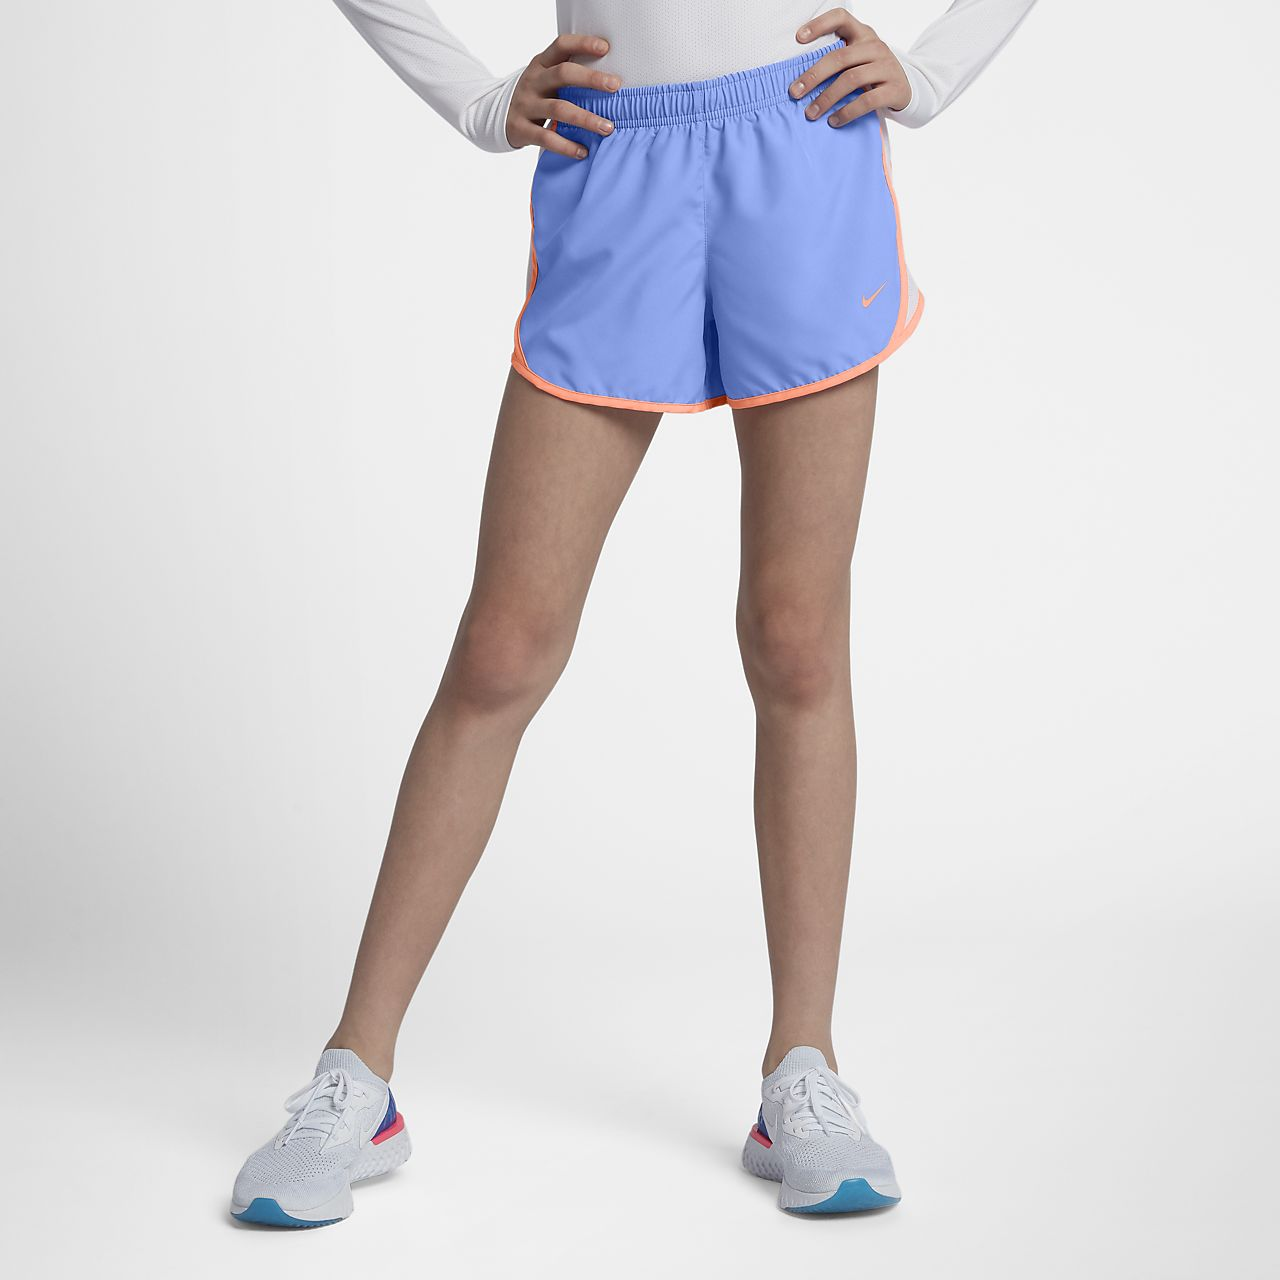 big girls in shorts